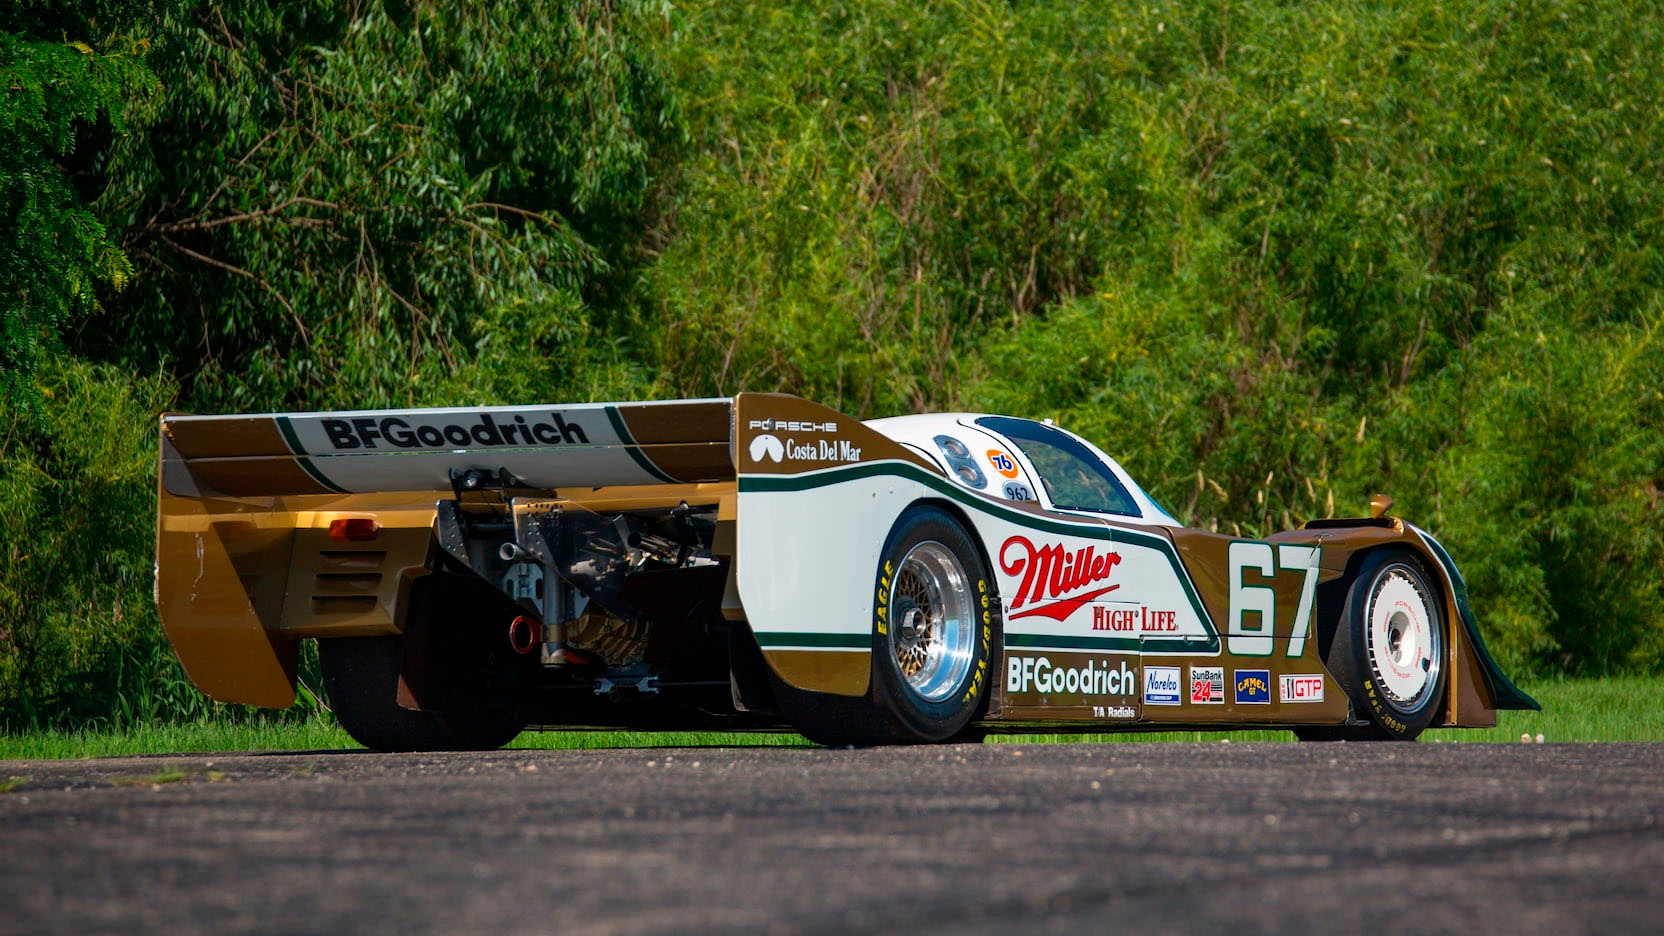 Daytona-winning 1989 Porsche 962